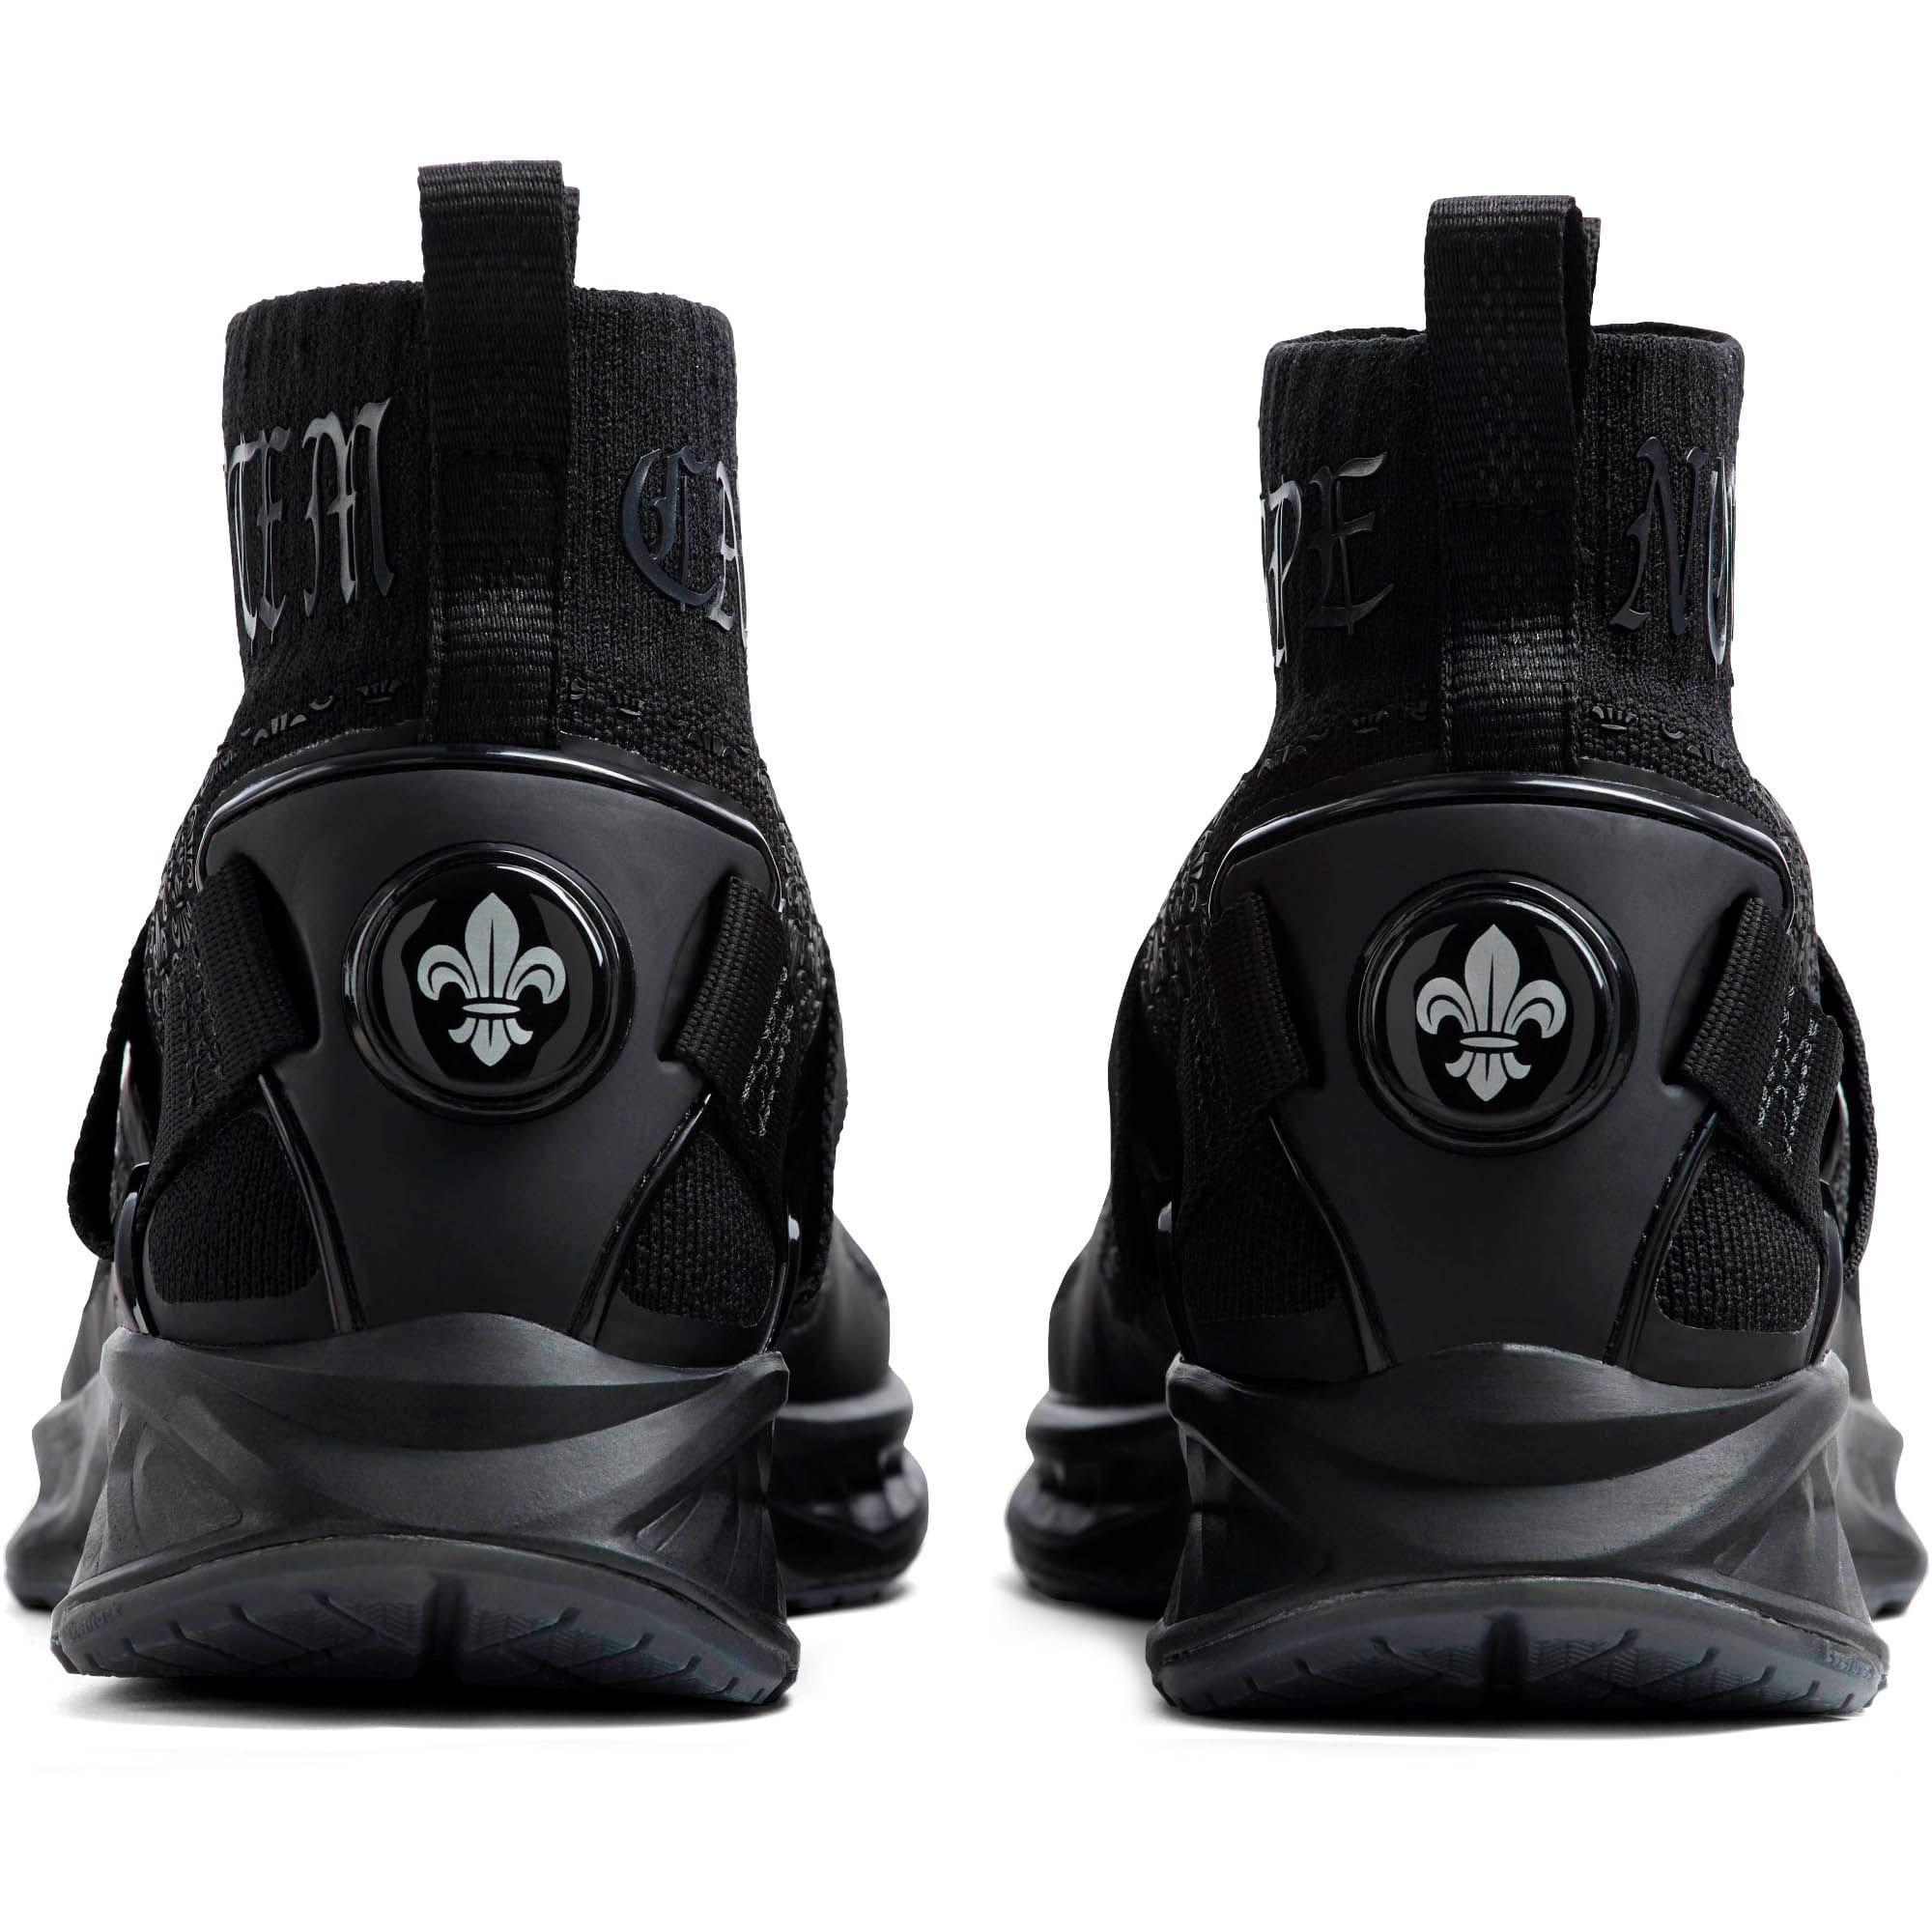 Thumbnail 4 of IGNITE evoKNIT En Noir Men's Training Shoes, Puma Black-Puma Black, medium